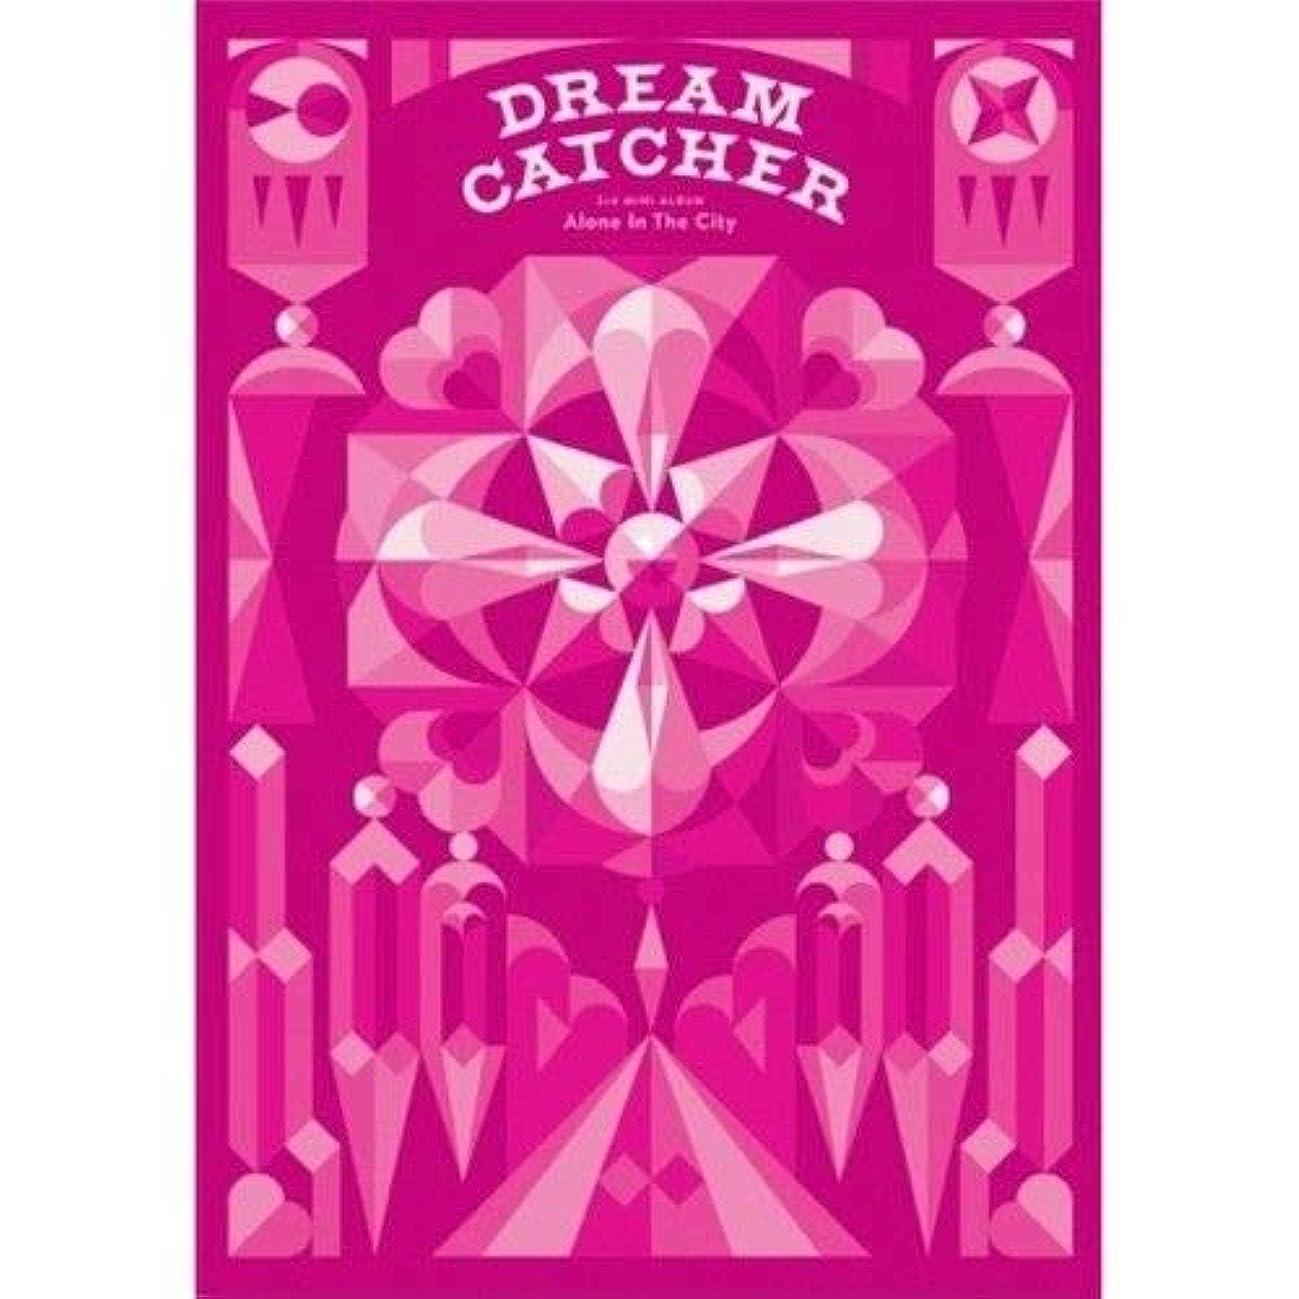 Dream Catcher - [Alone in The City]3rd Mini Album Light Ver CD+PhotoBook+Card+Sticker+Pre-Order K-POP Sealed